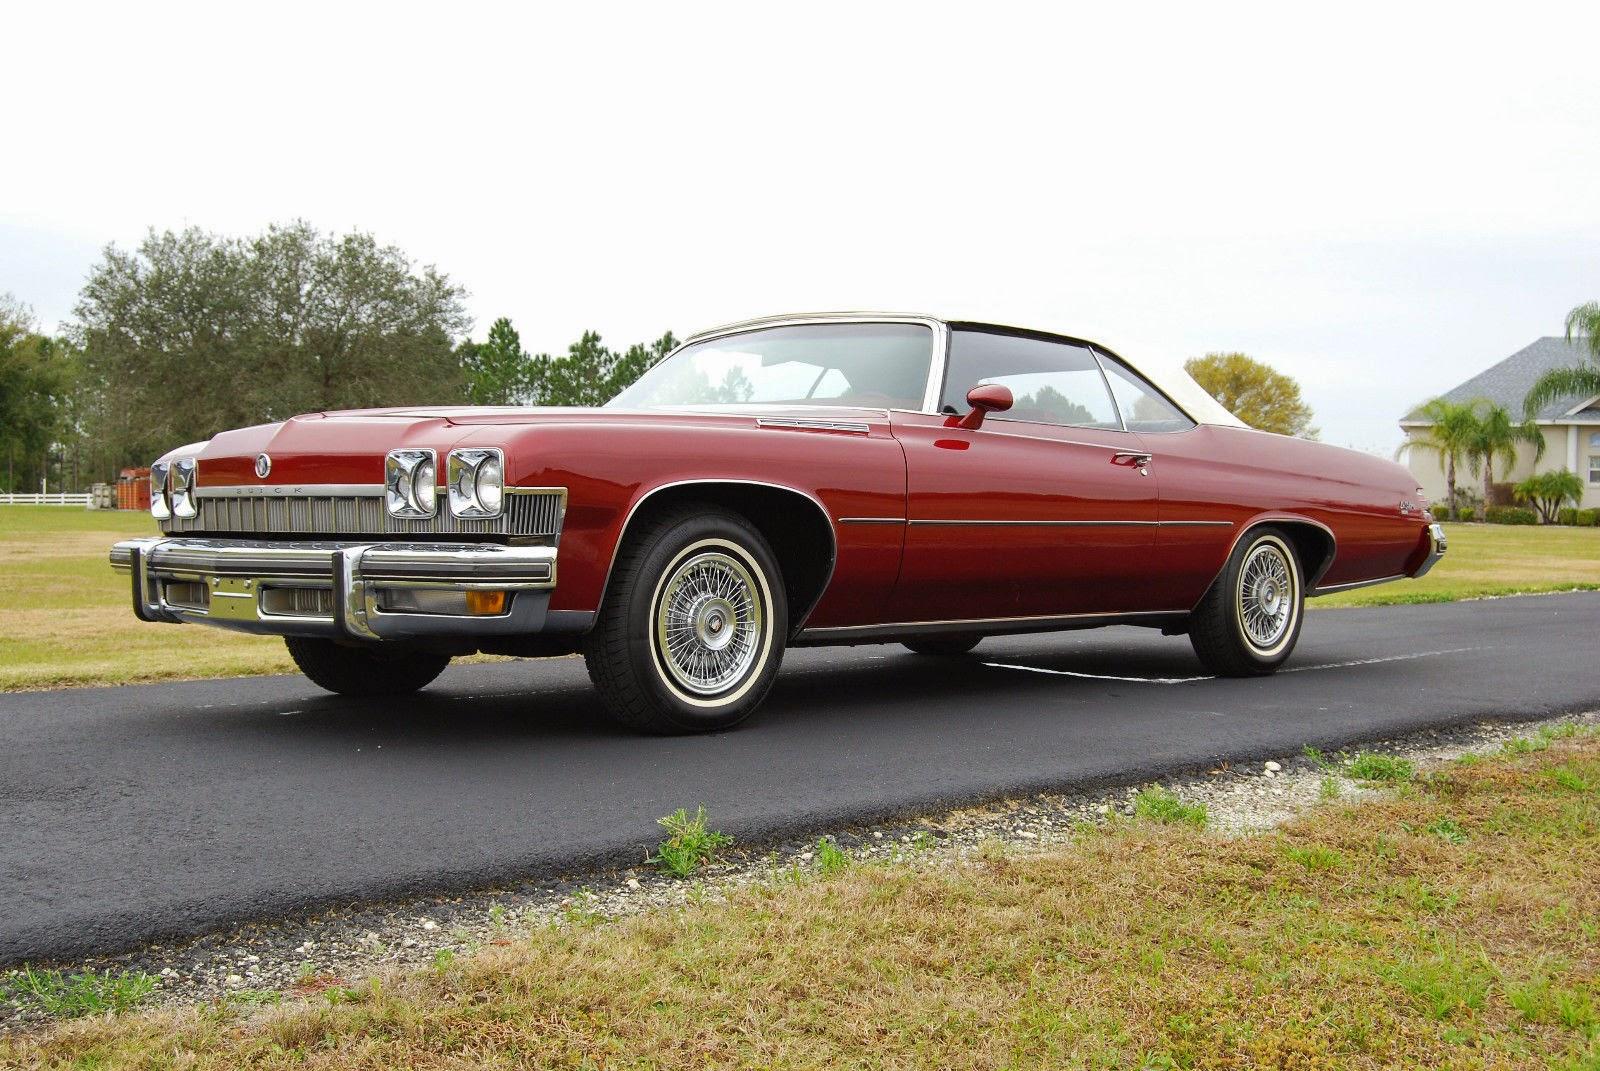 All American Classic Cars: 1974 Buick LeSabre Luxus 2-Door